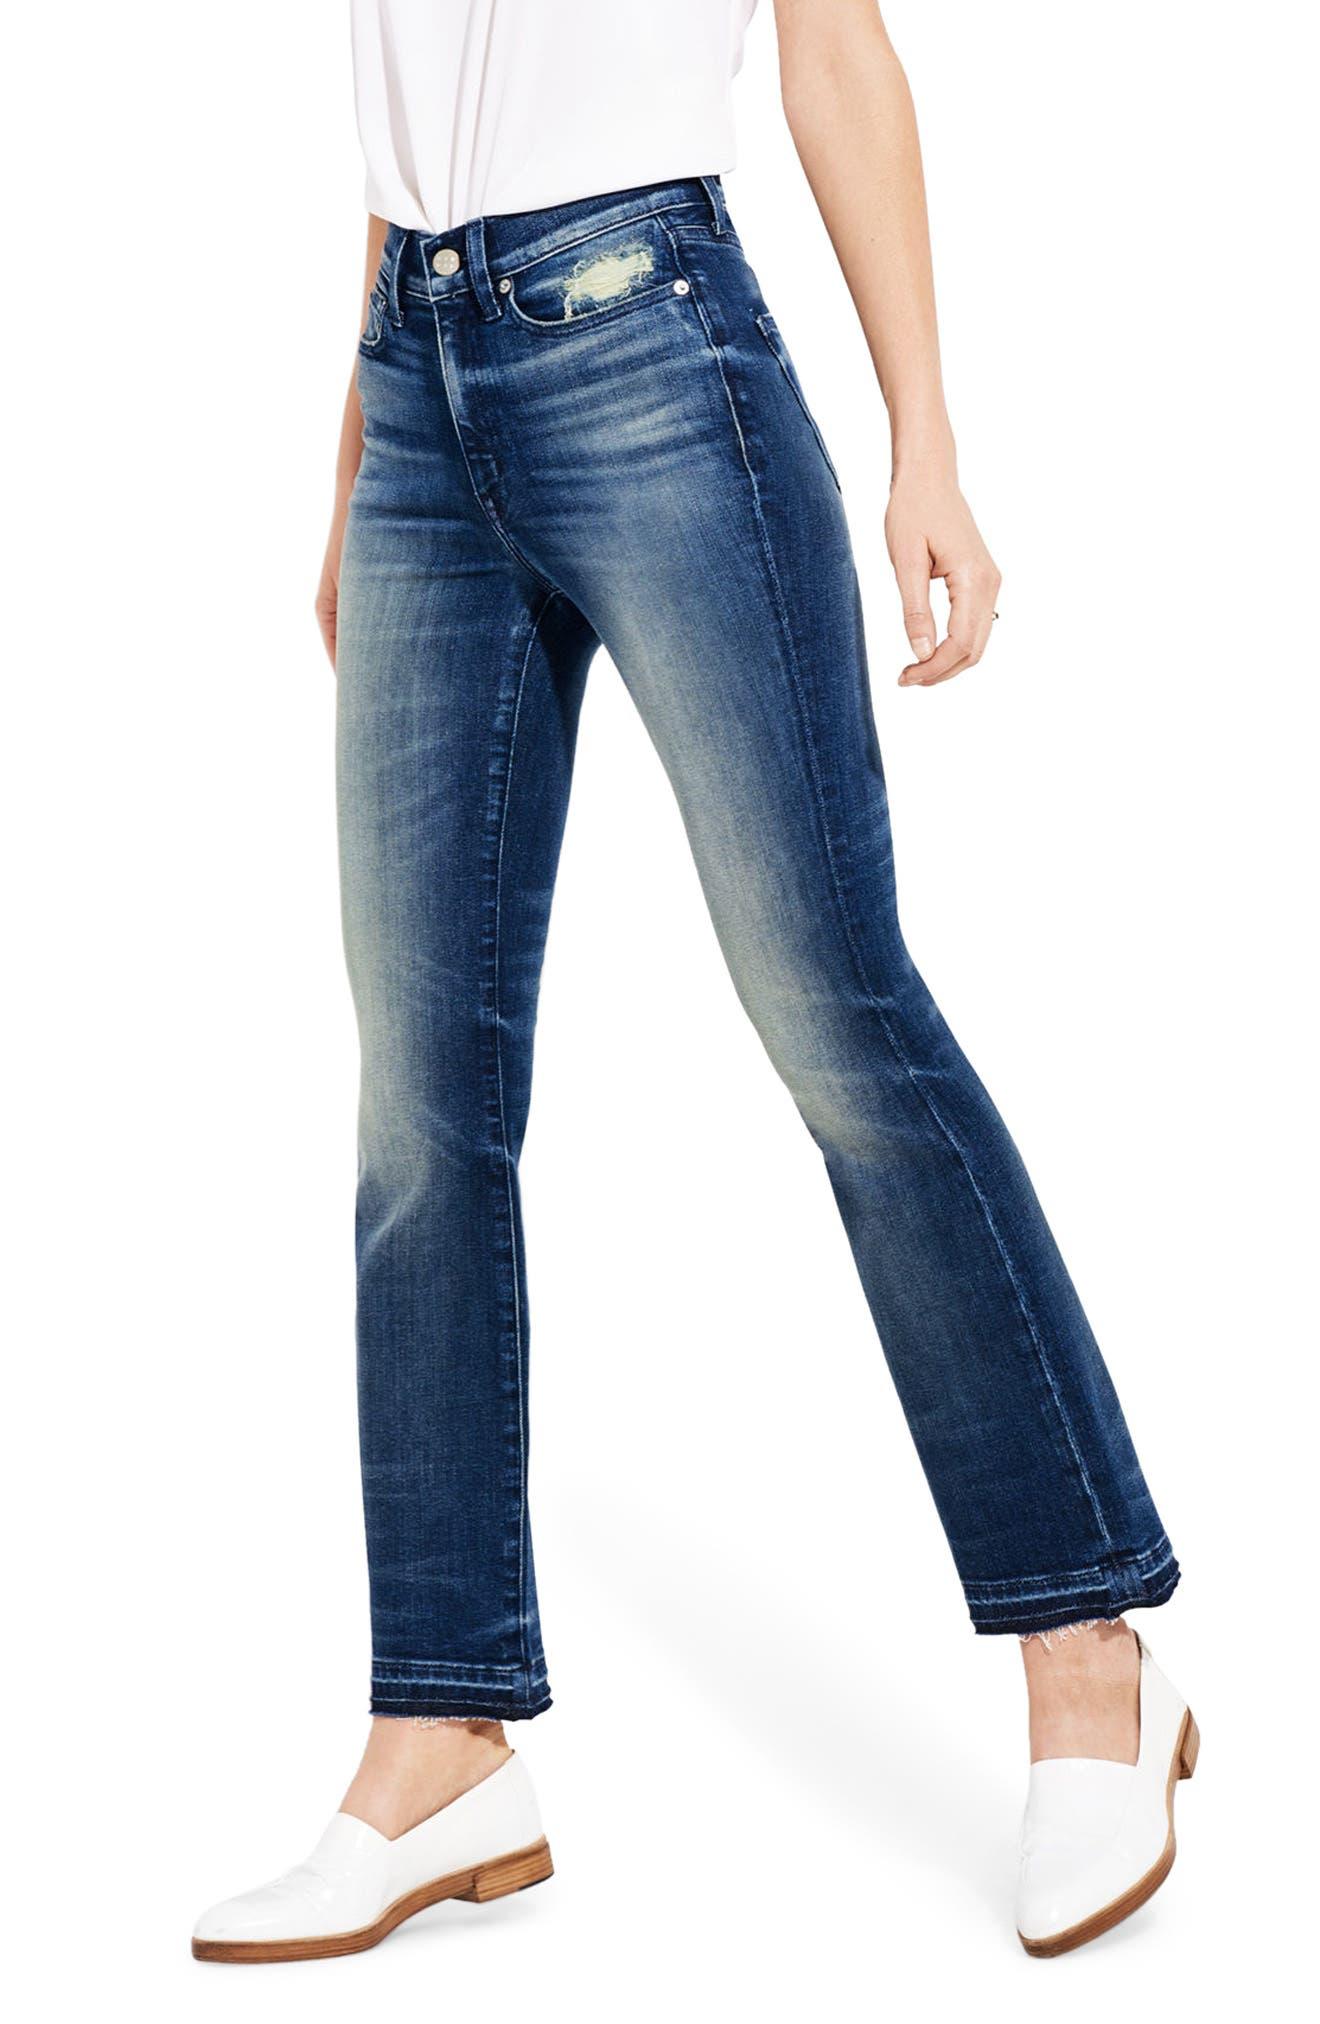 Alternate Image 1 Selected - AYR The Superba Straight Leg Ankle Jeans (Cobra)